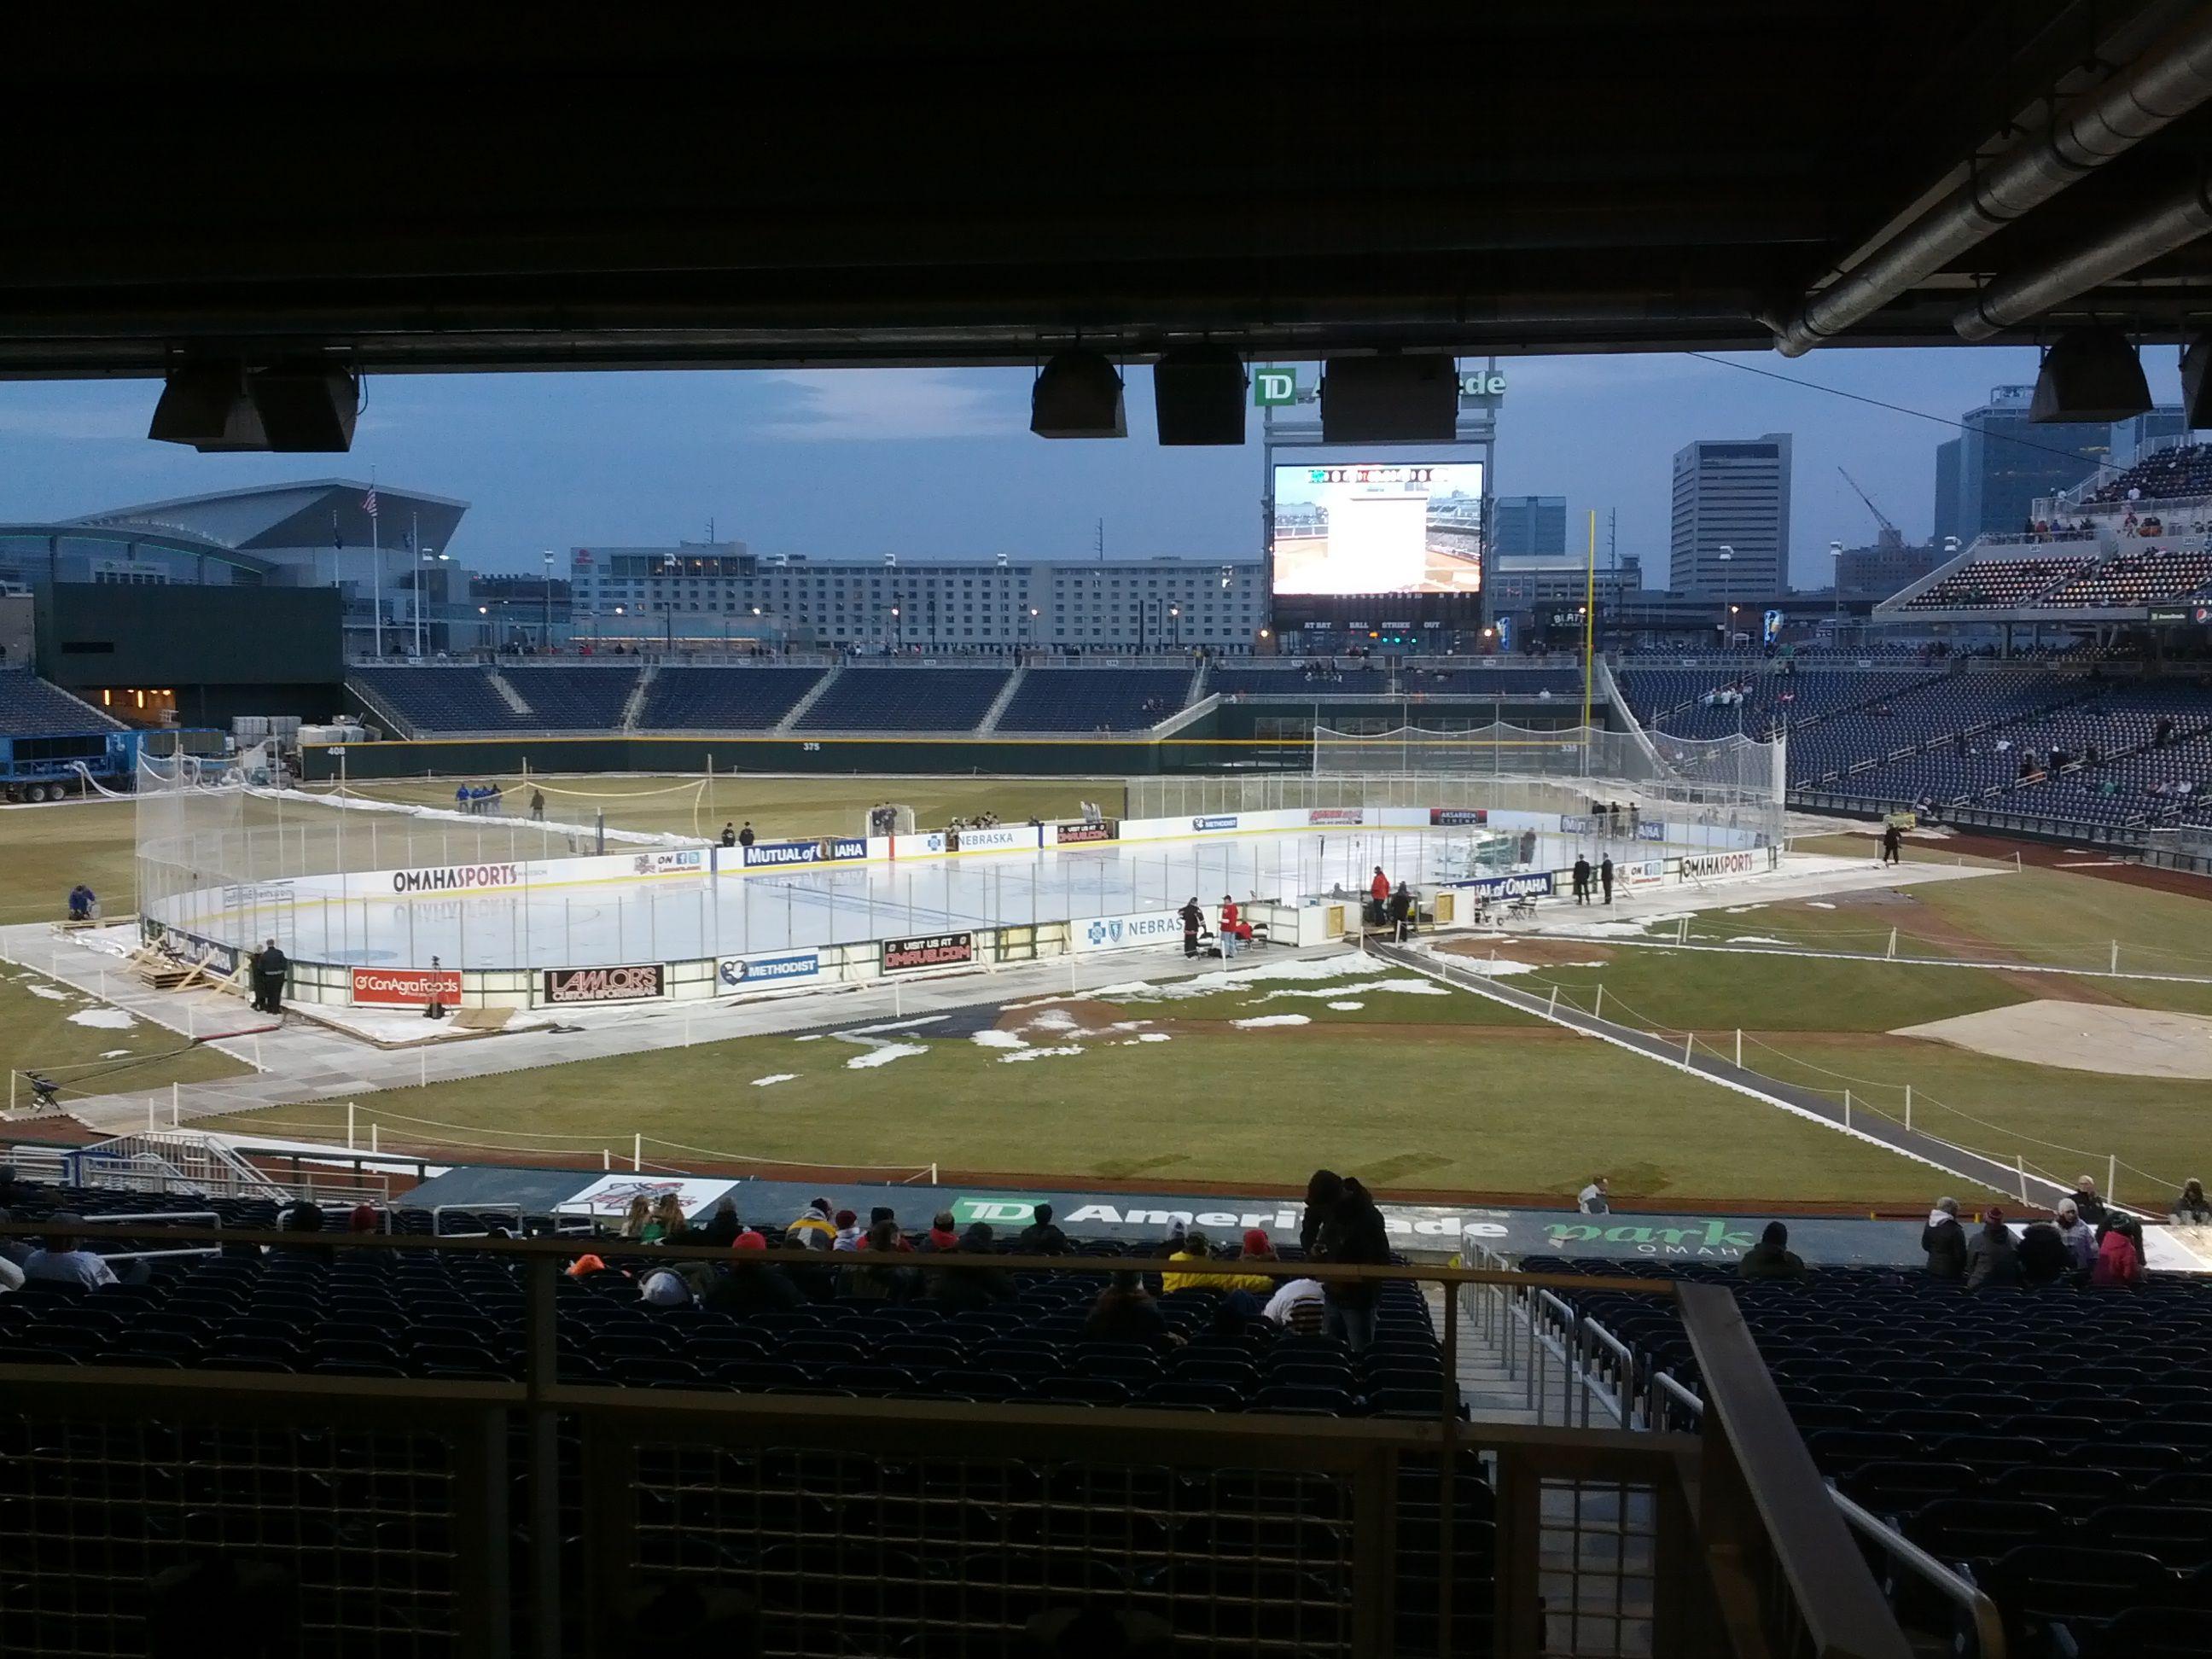 Lincoln Stars Vs Omaha Lancers Battles On Ice 2013